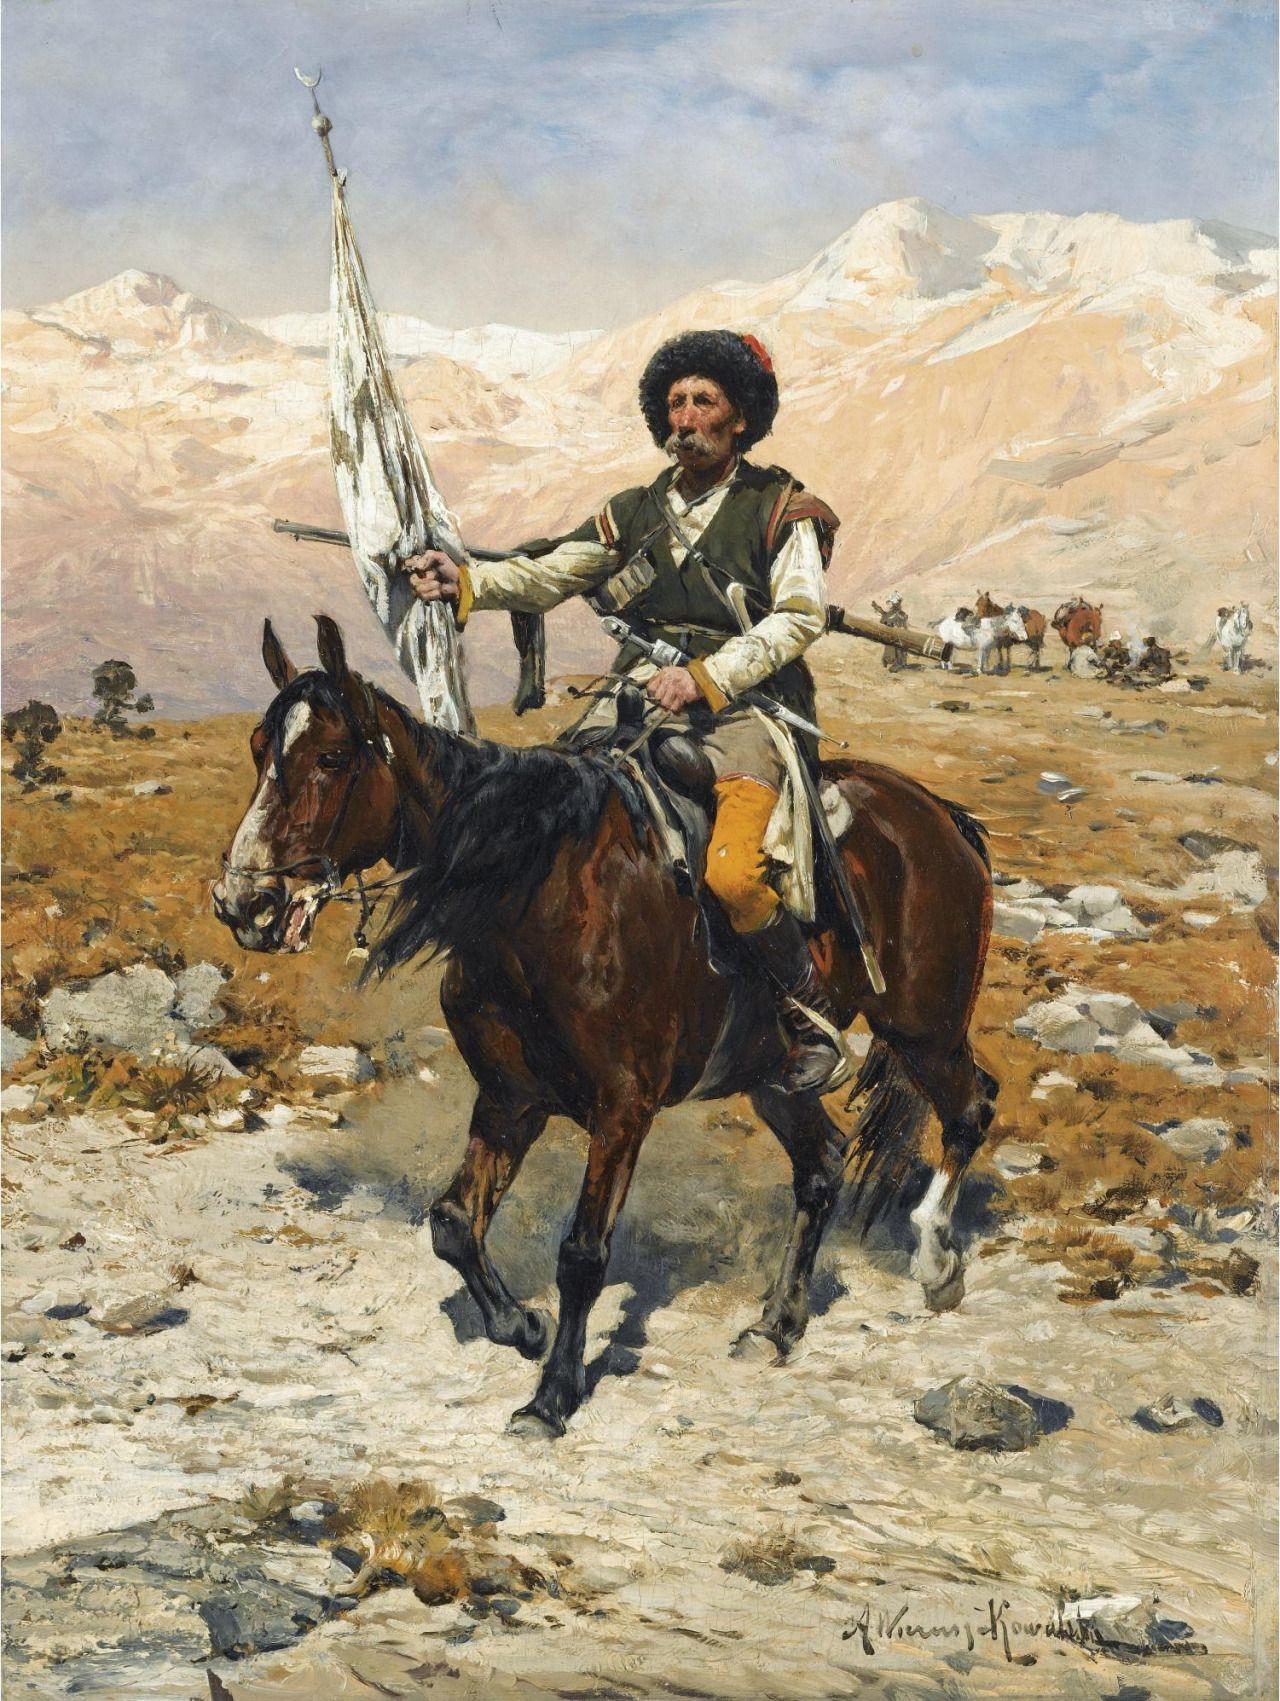 Windandsails Alfred Wierusz Kowalski 1849 1915